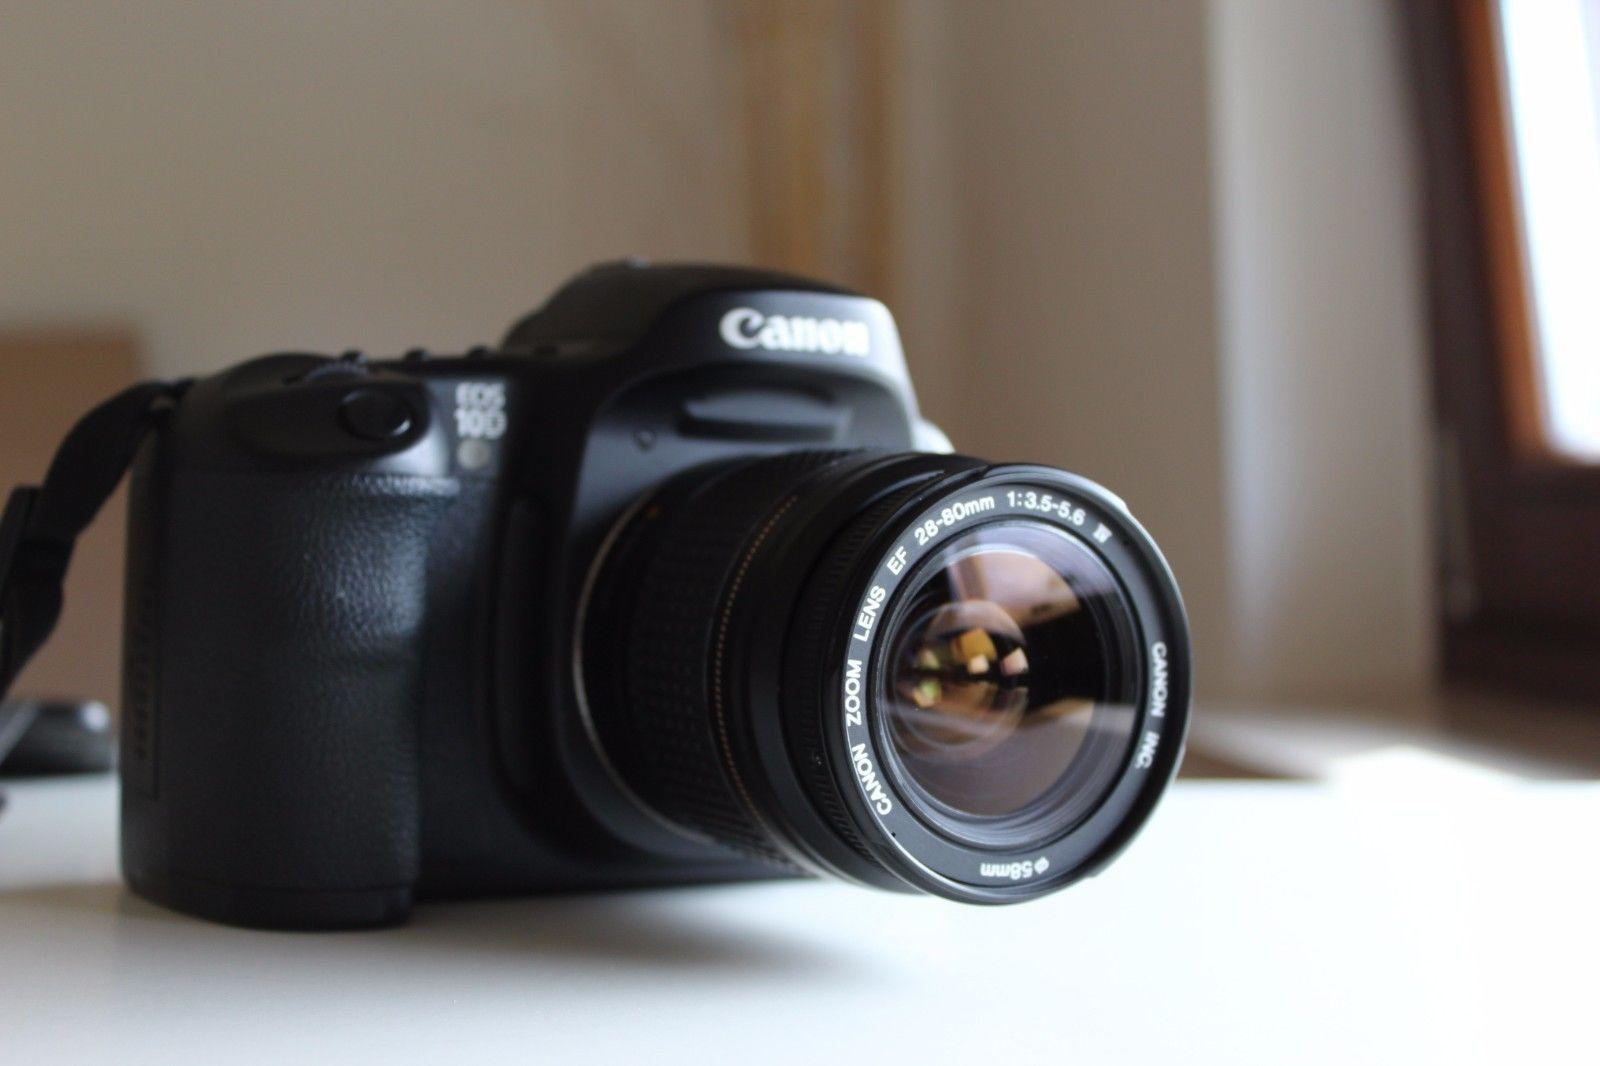 Canon Eos 10d 6 3 Mp Digital Slr Camera Black 28 80mm Zoom Lens Digital Slr Canon Eos Eos